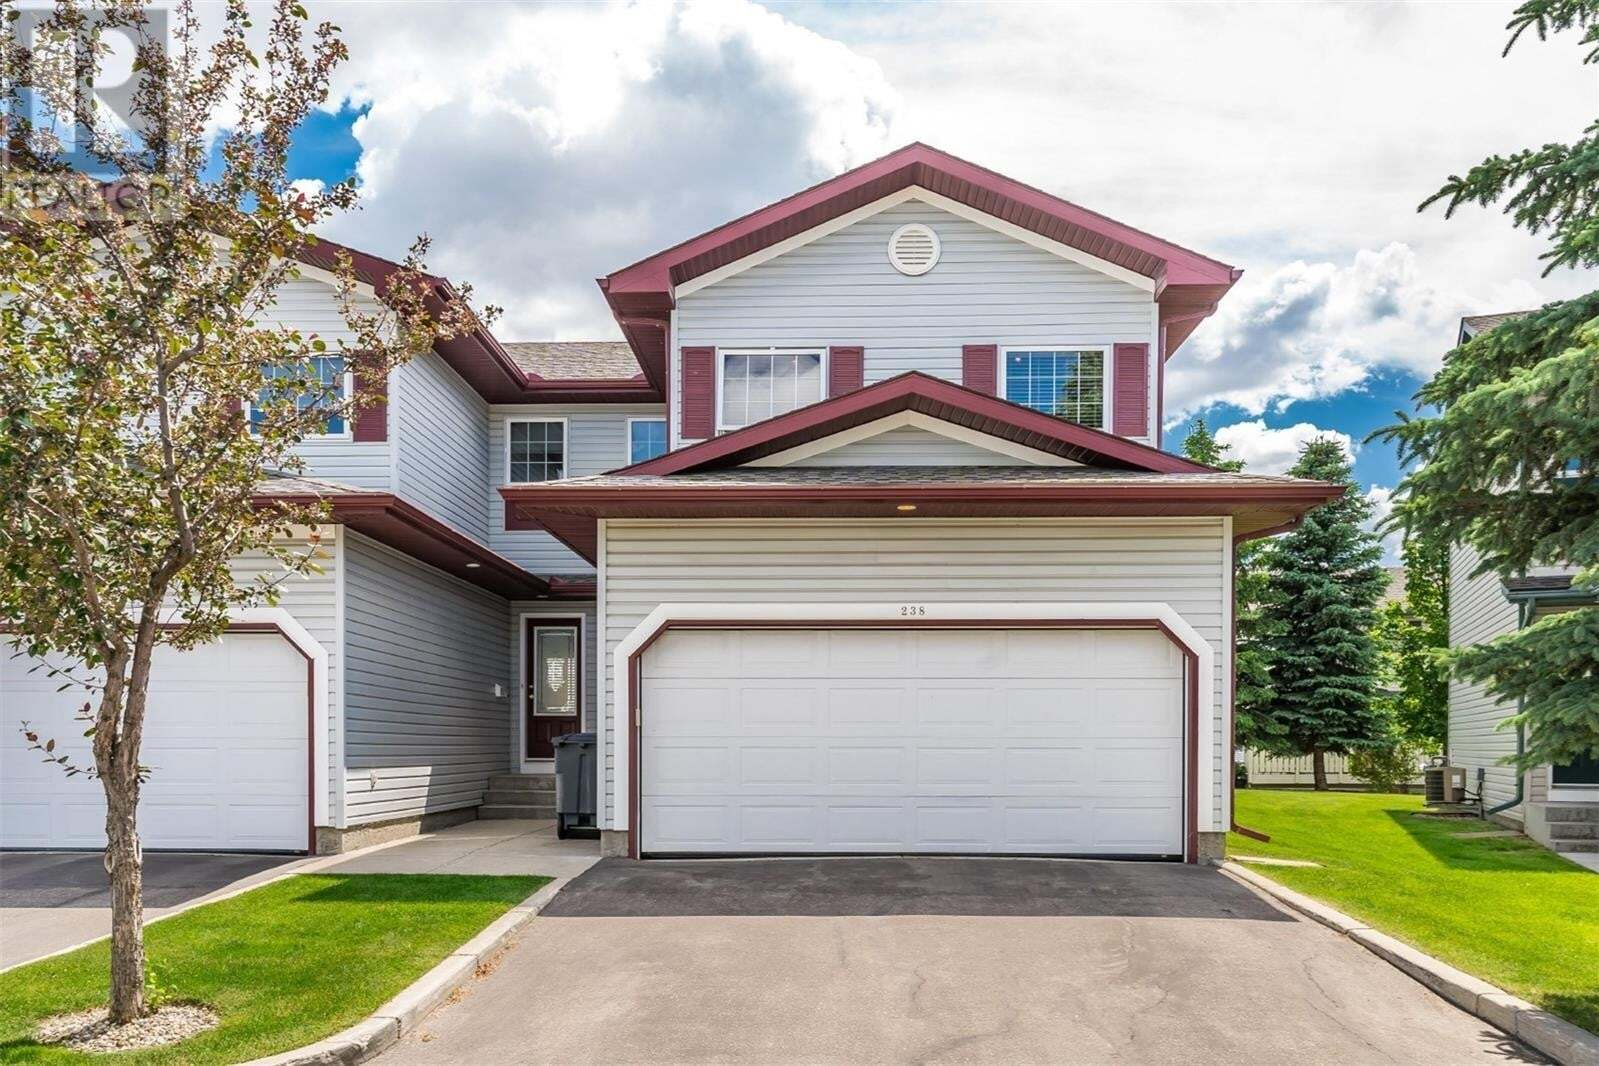 Townhouse for sale at 615 Kenderdine Rd Unit 238 Saskatoon Saskatchewan - MLS: SK814021